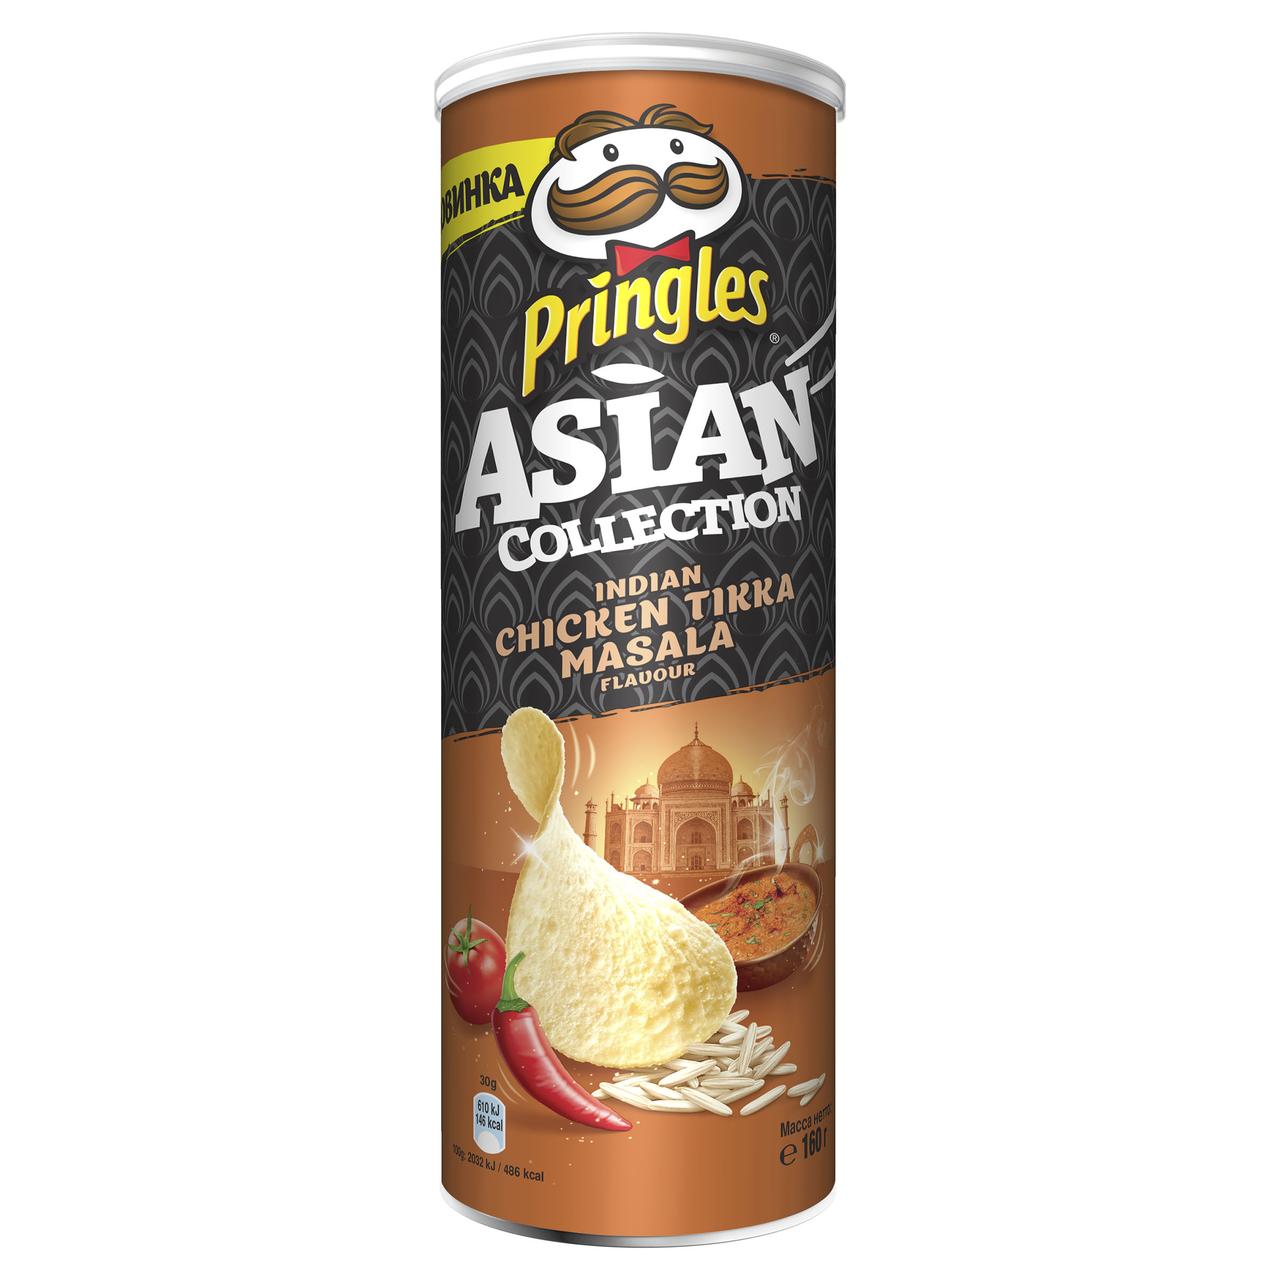 Чіпси Pringles Asian collection Tikka Masala рисові 160г